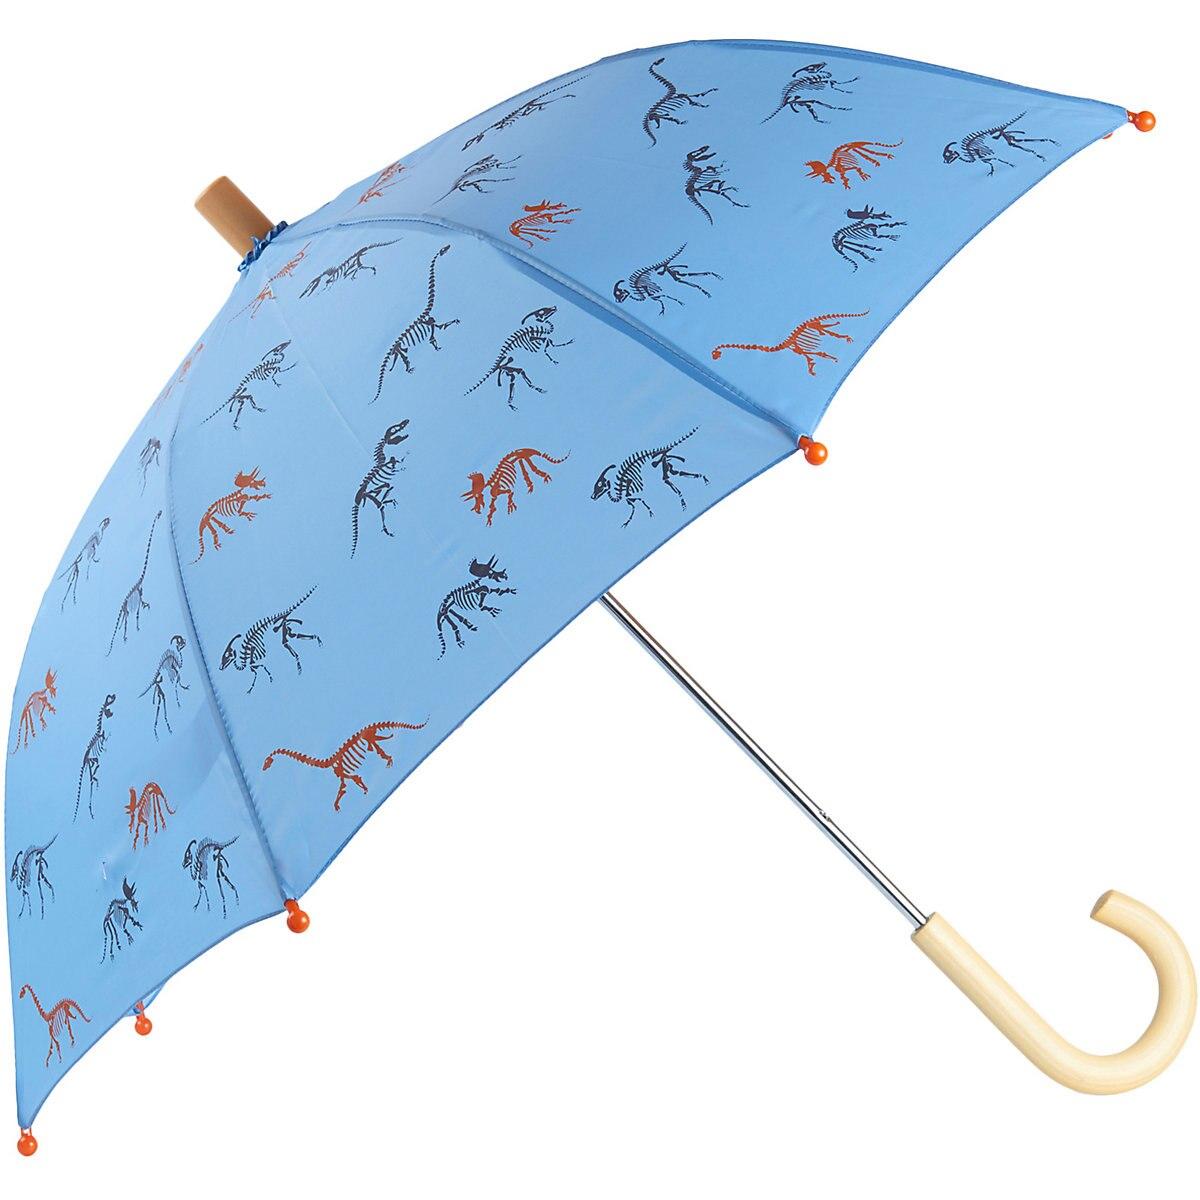 Hatley Umbrellas 10740766 umbrella rain protection for children of boys and girls